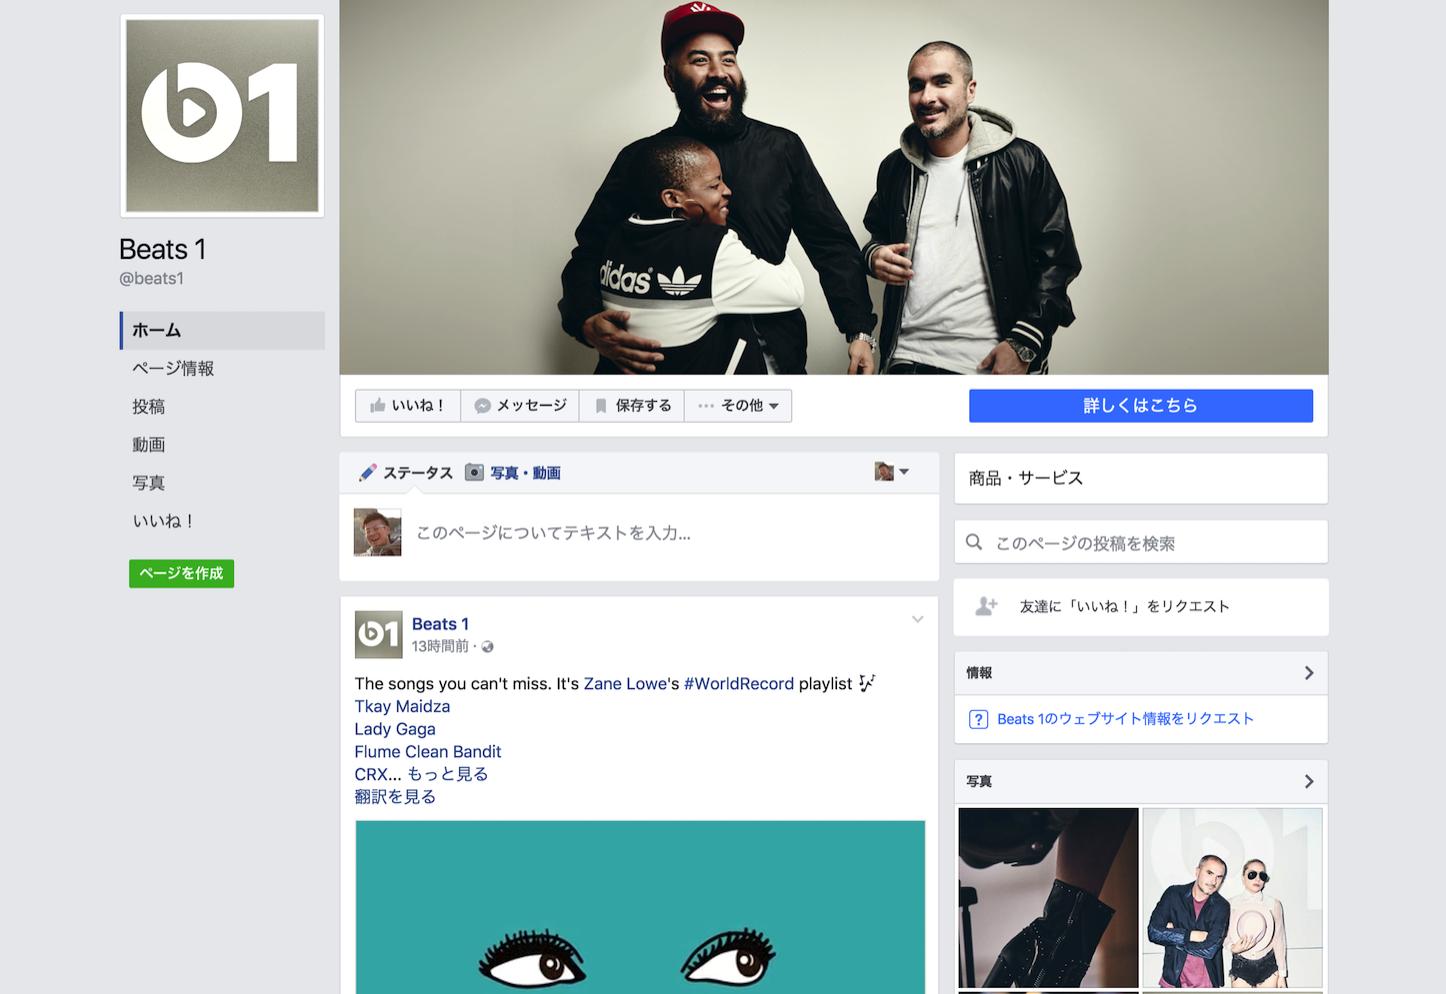 Beats1 Facebook Page